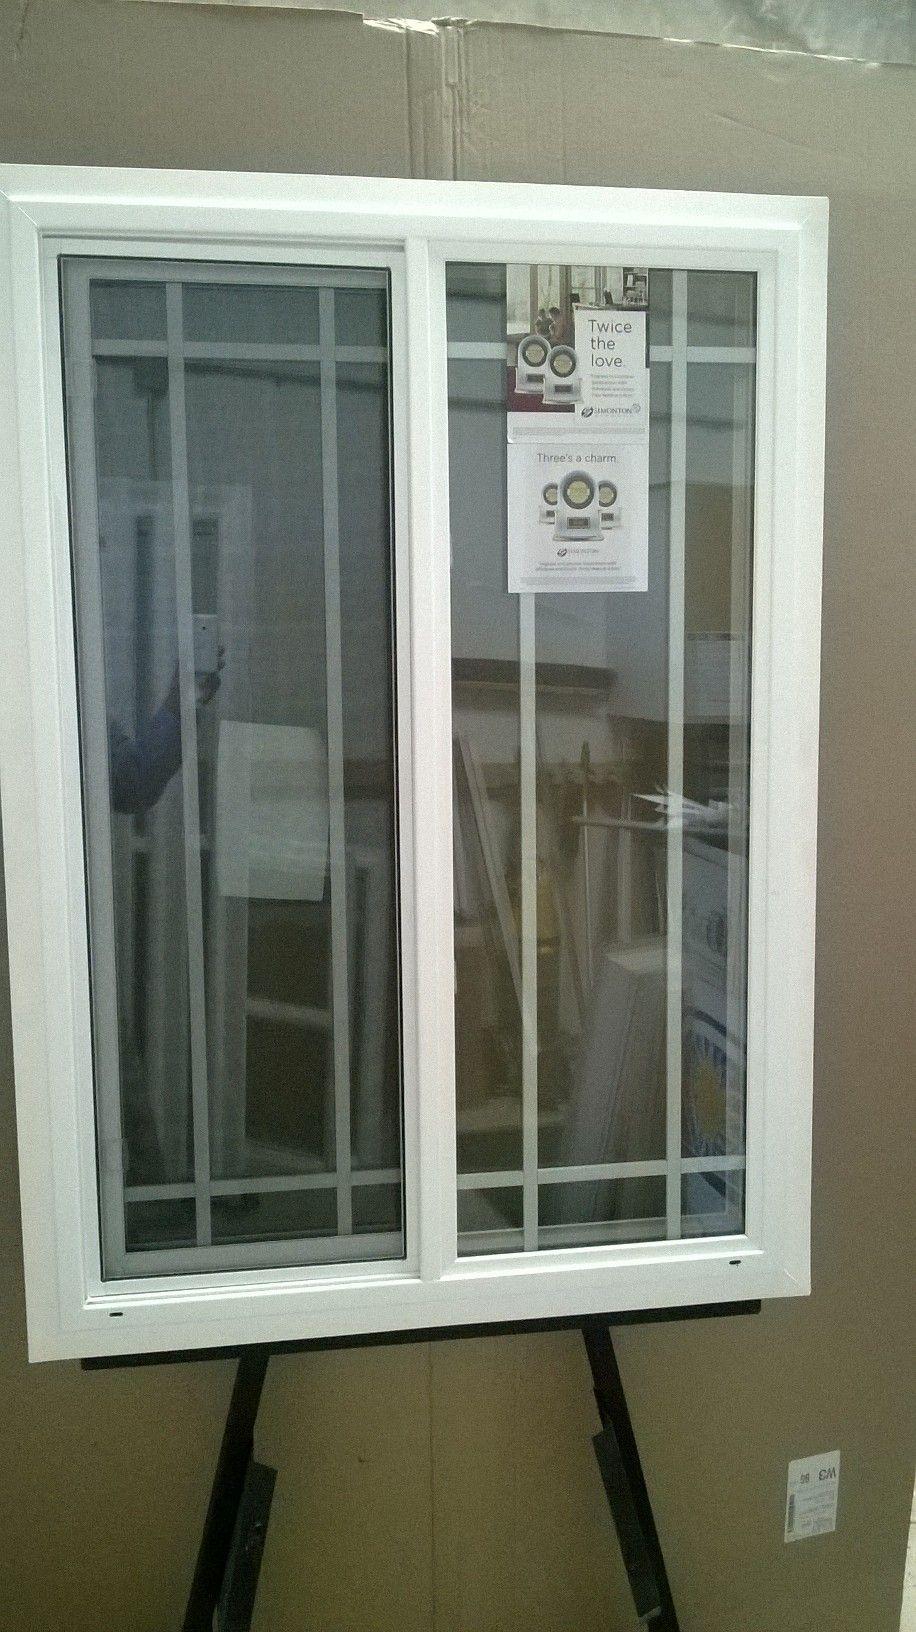 Window 49 Simonton Xo Slider Perimeter Flat Grids Retrofit White 30 3 4 X 44 1